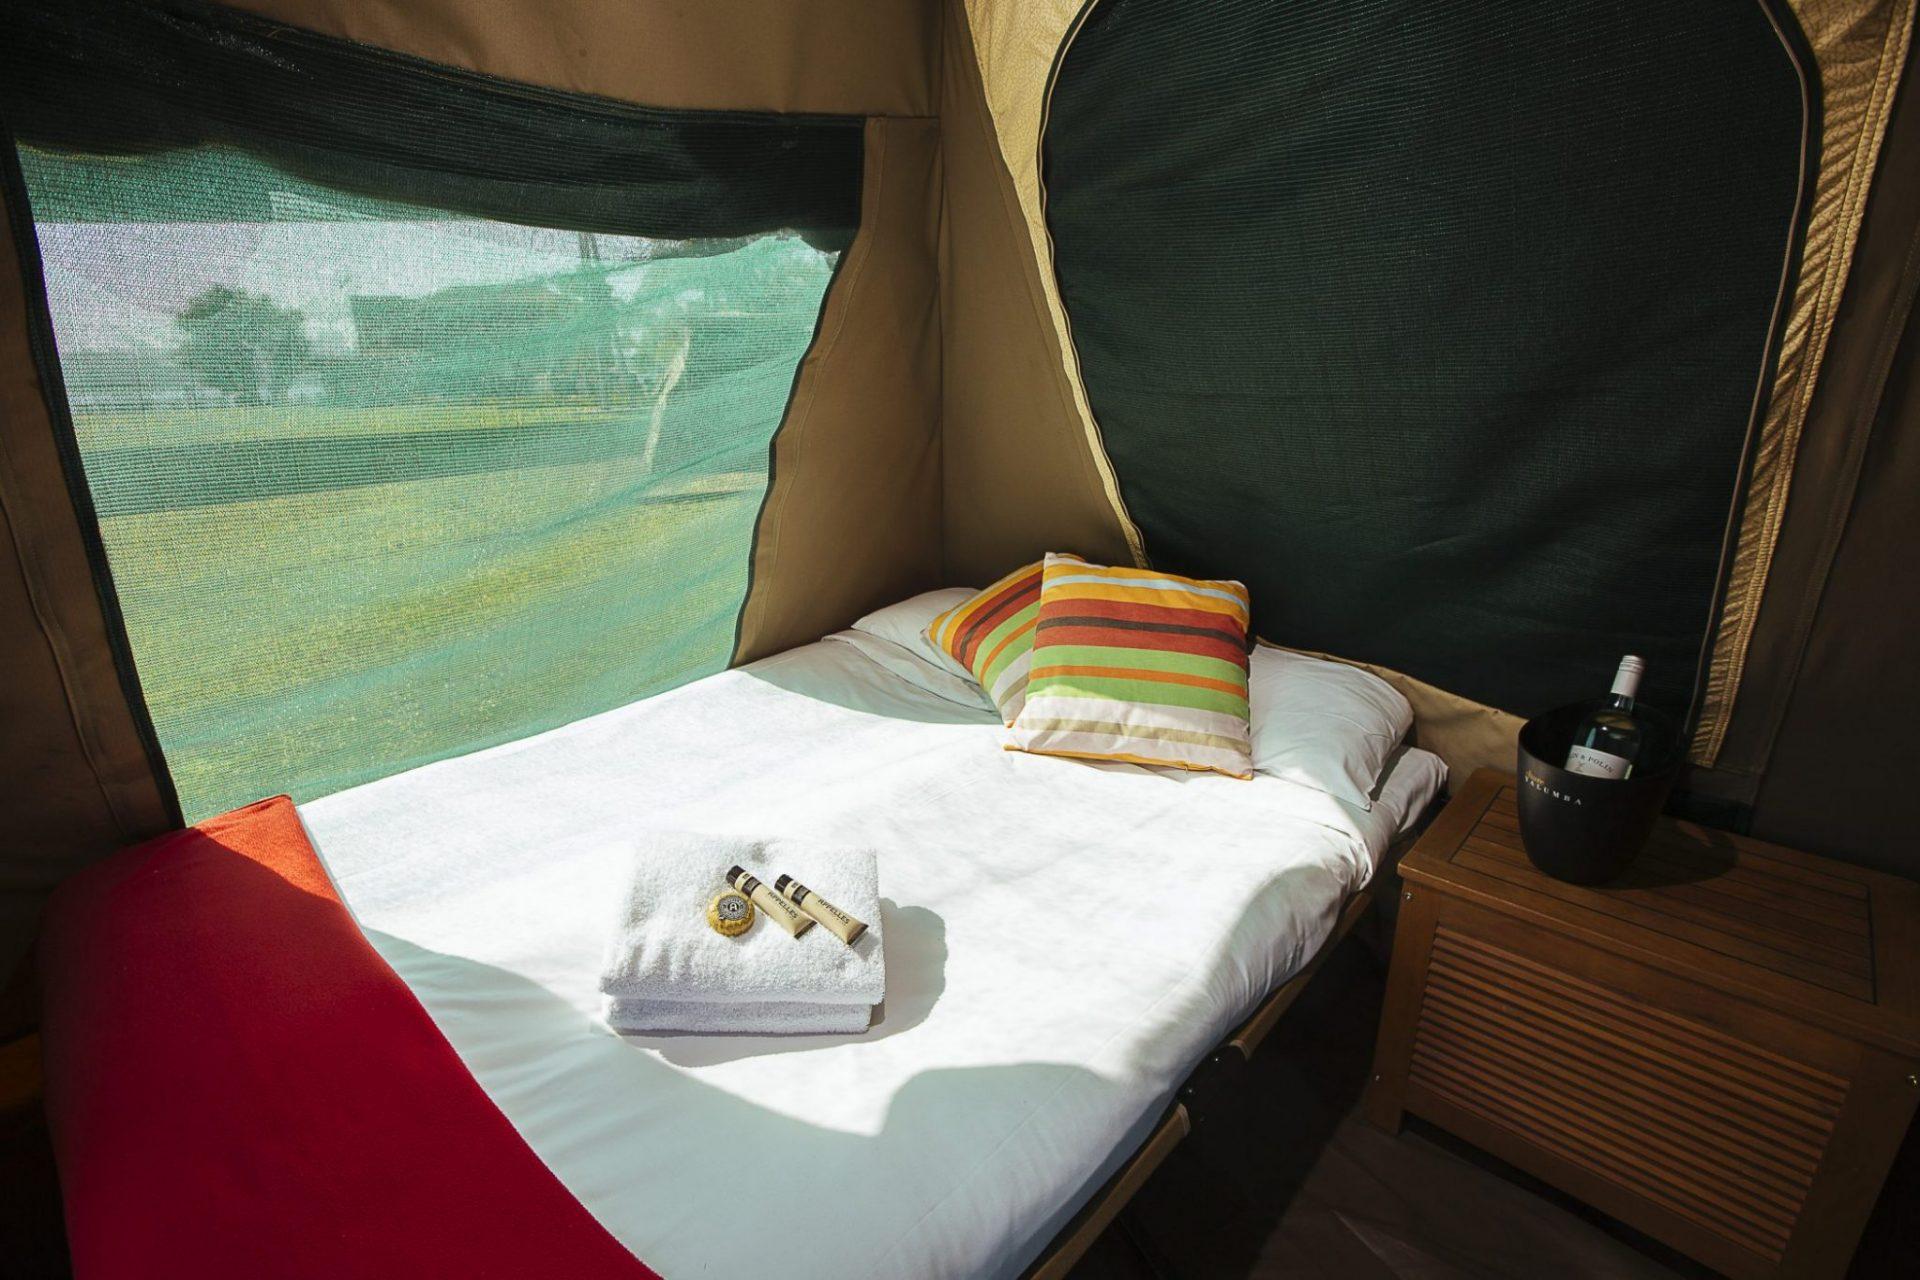 Bed inside the glamping tent, Cockatoo Island Credit - Zakarij Kaczmarek